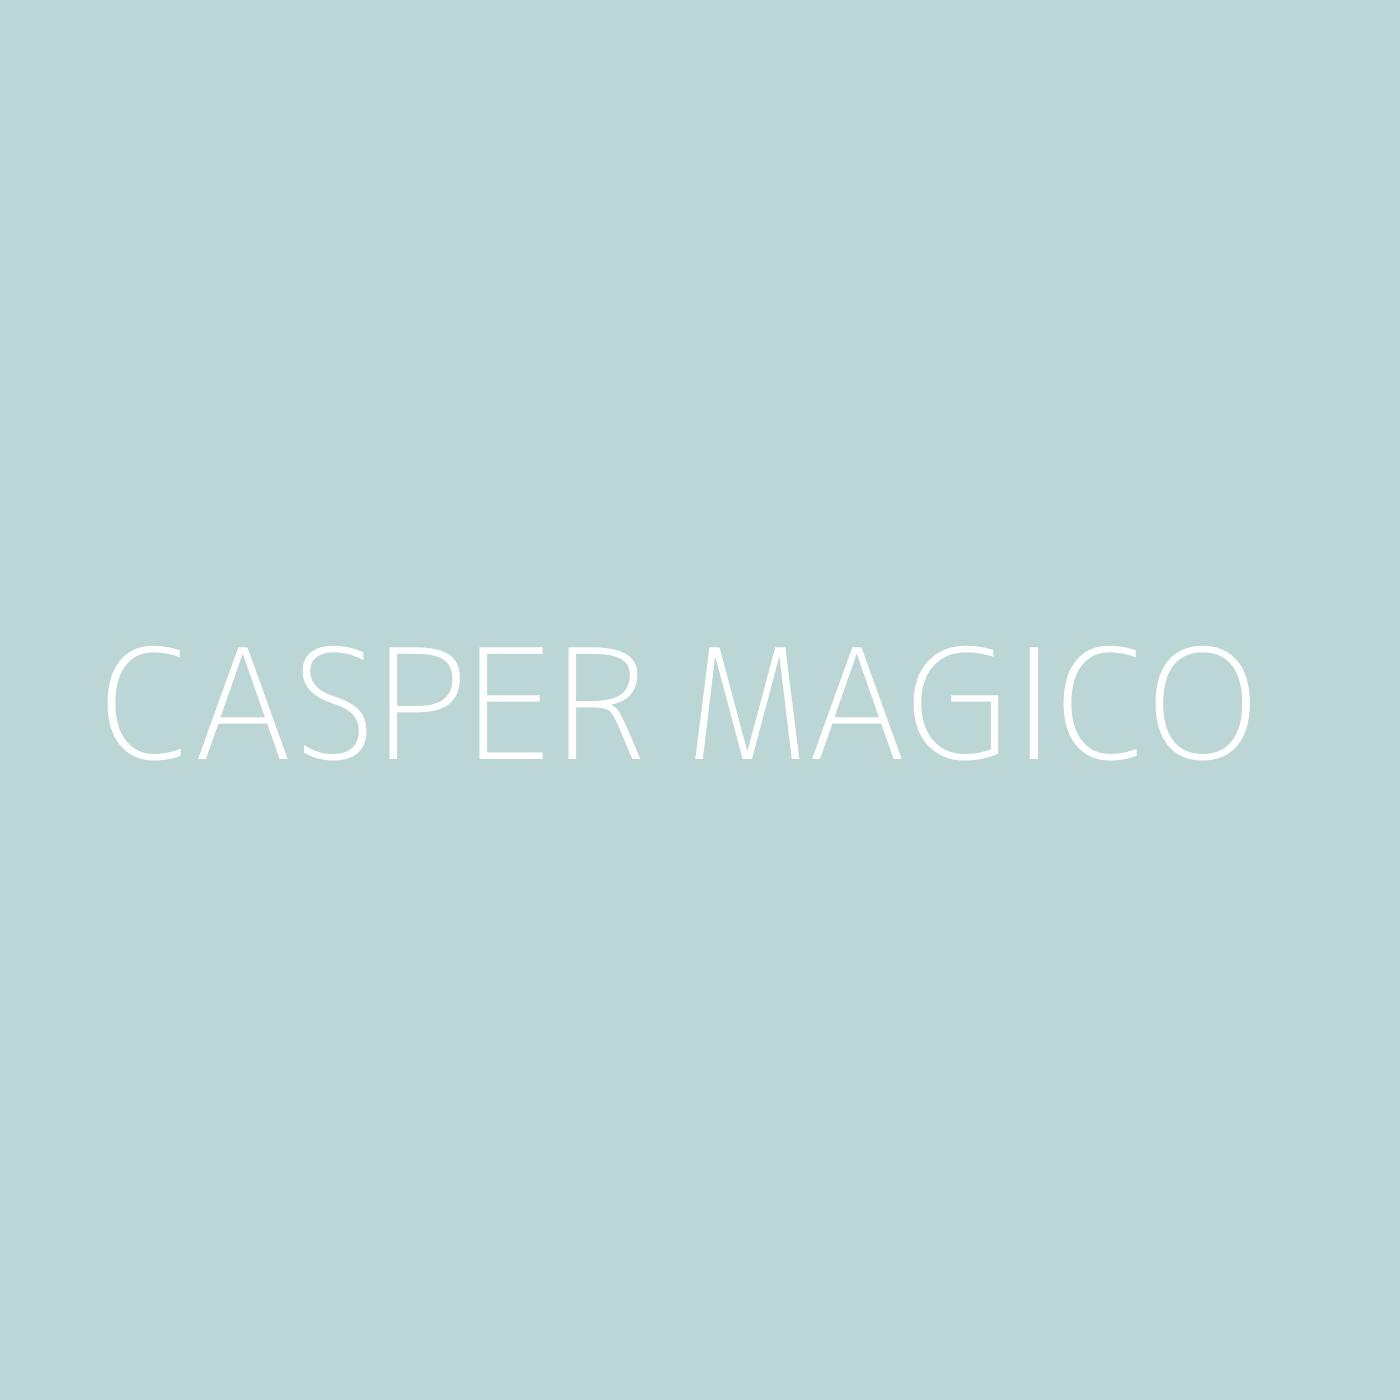 Casper Magico Playlist Artwork